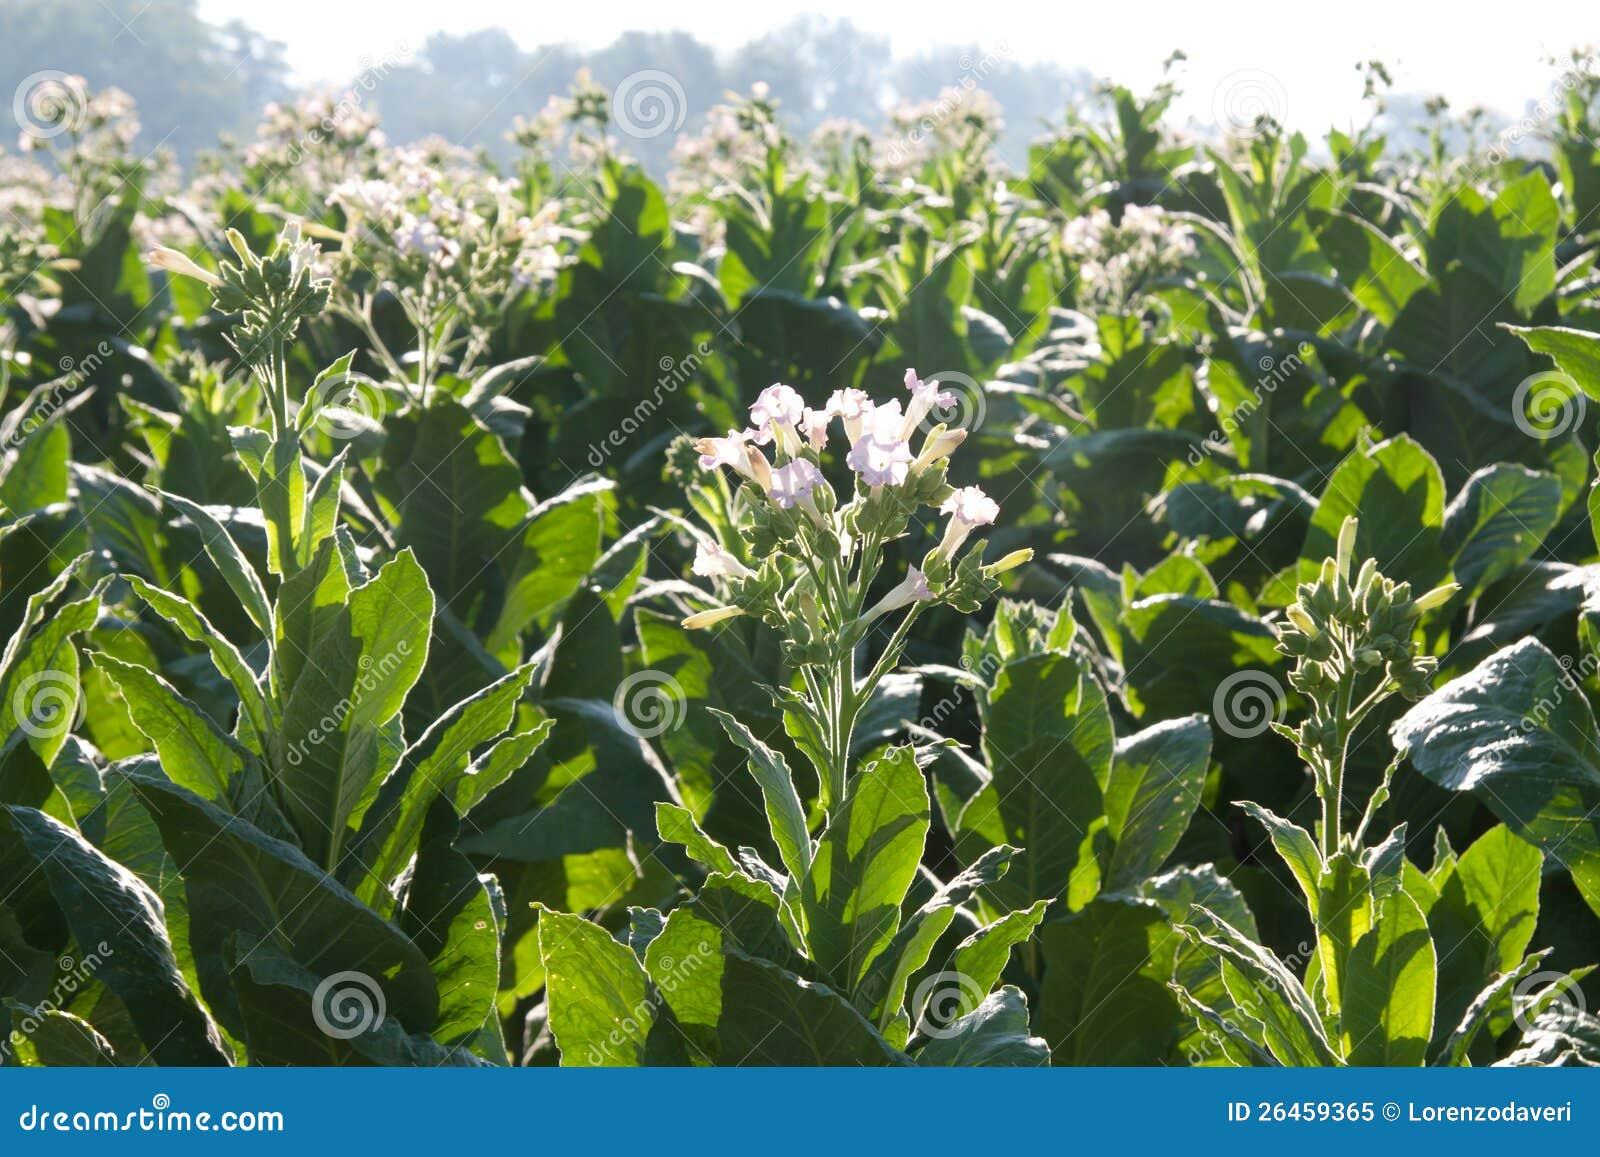 fleur de tabac image stock image du zone leafs virginia 26459365. Black Bedroom Furniture Sets. Home Design Ideas